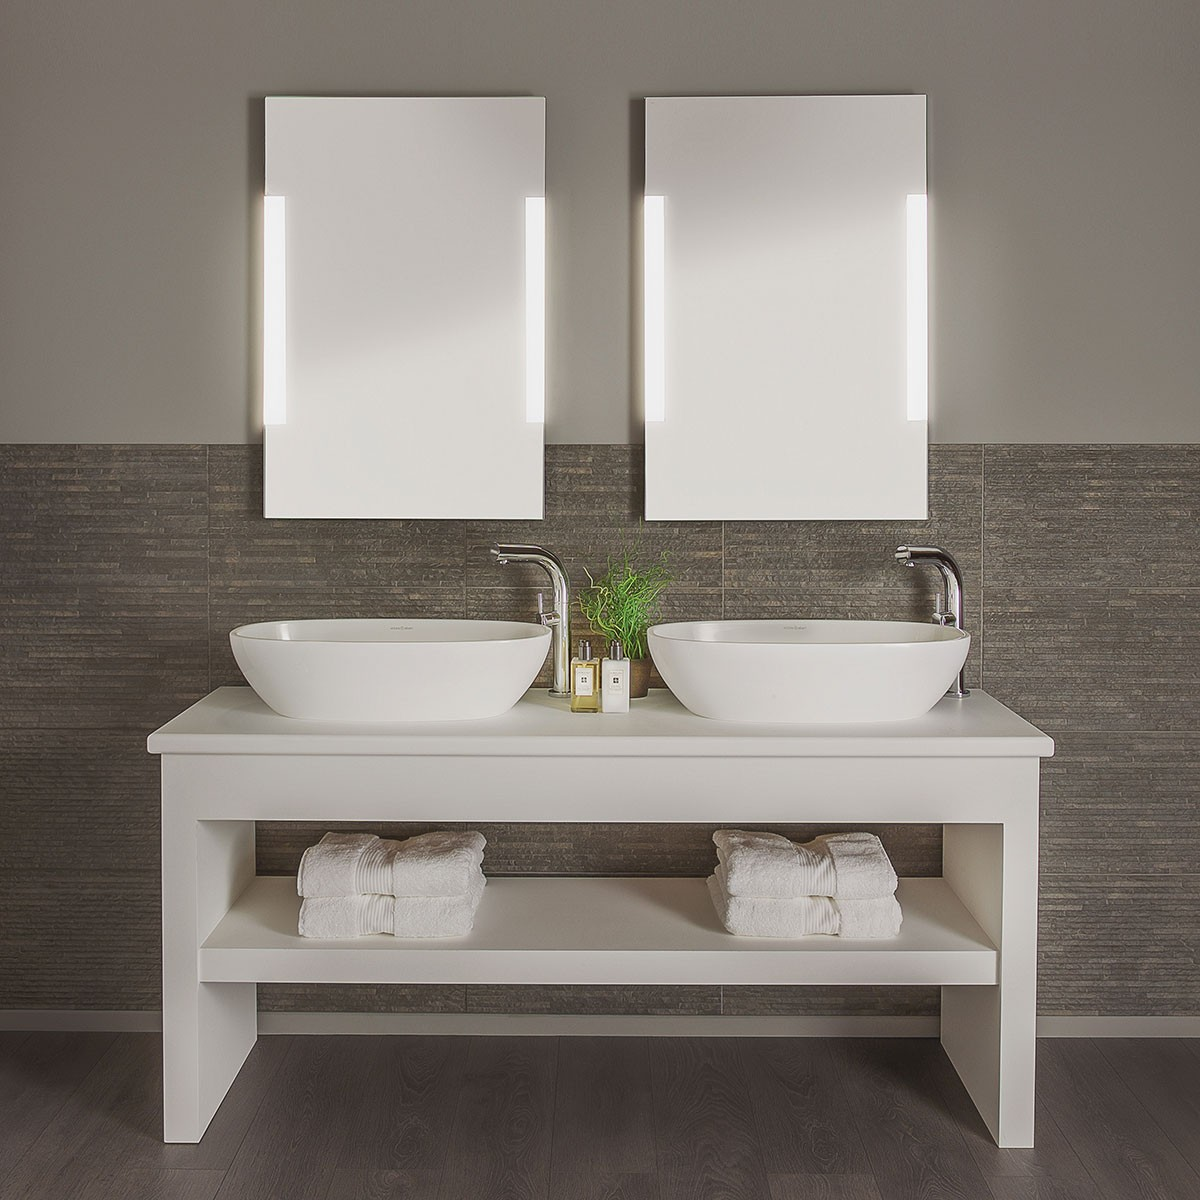 Astro Imola 900 Polished Chrome Bathroom Mirror Light at ...